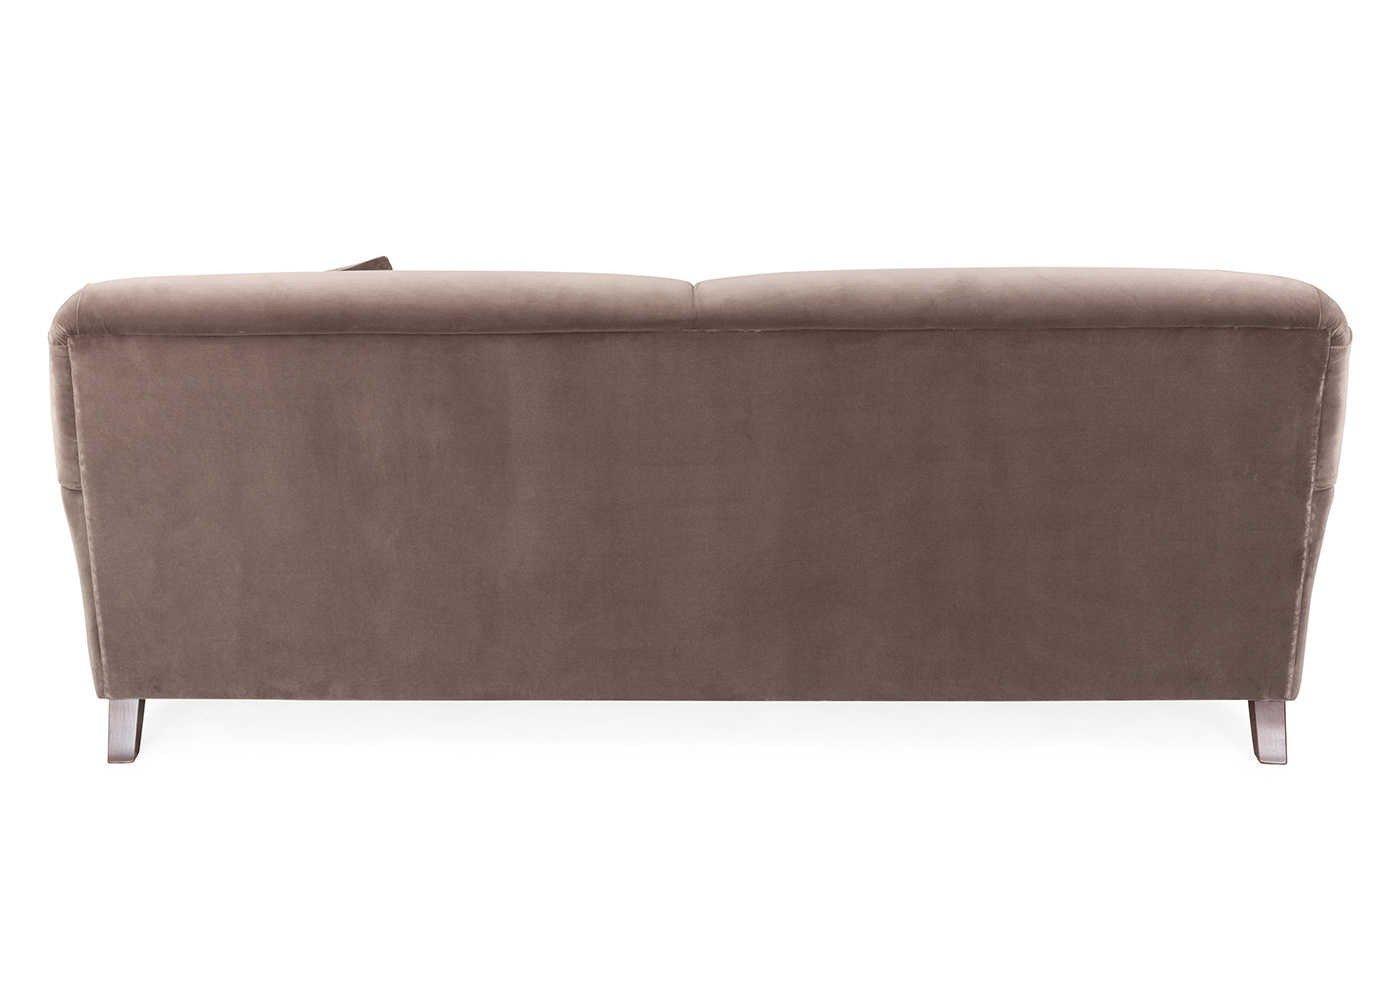 Hampstead 4 Seater Sofa – 4 Seater Sofa – Sofas Regarding Large 4 Seater Sofas (View 12 of 20)